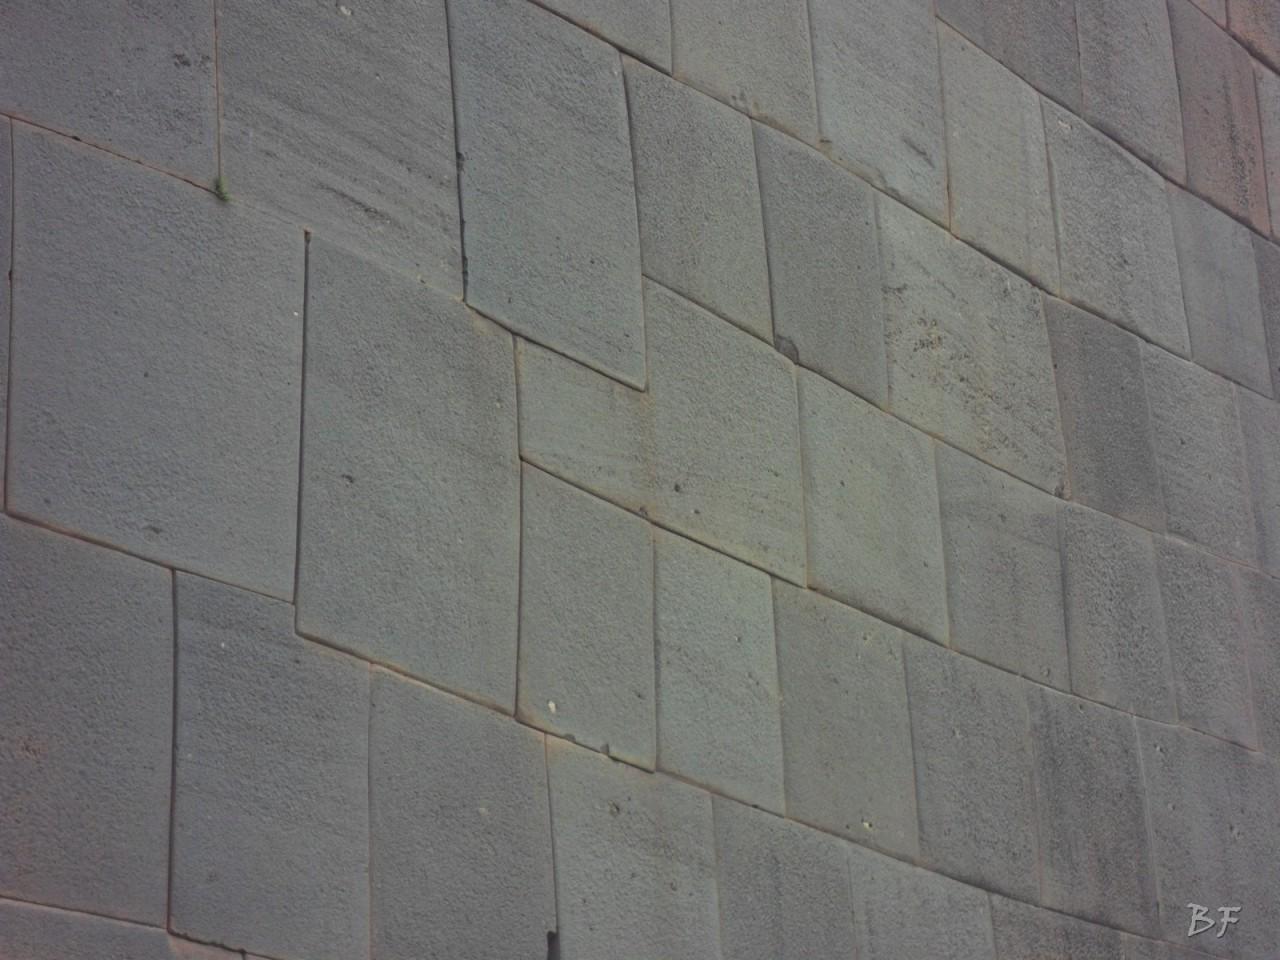 Mura-Poligonali-Megaliti-Tempio-Coricancha-Cusco-Perù-6